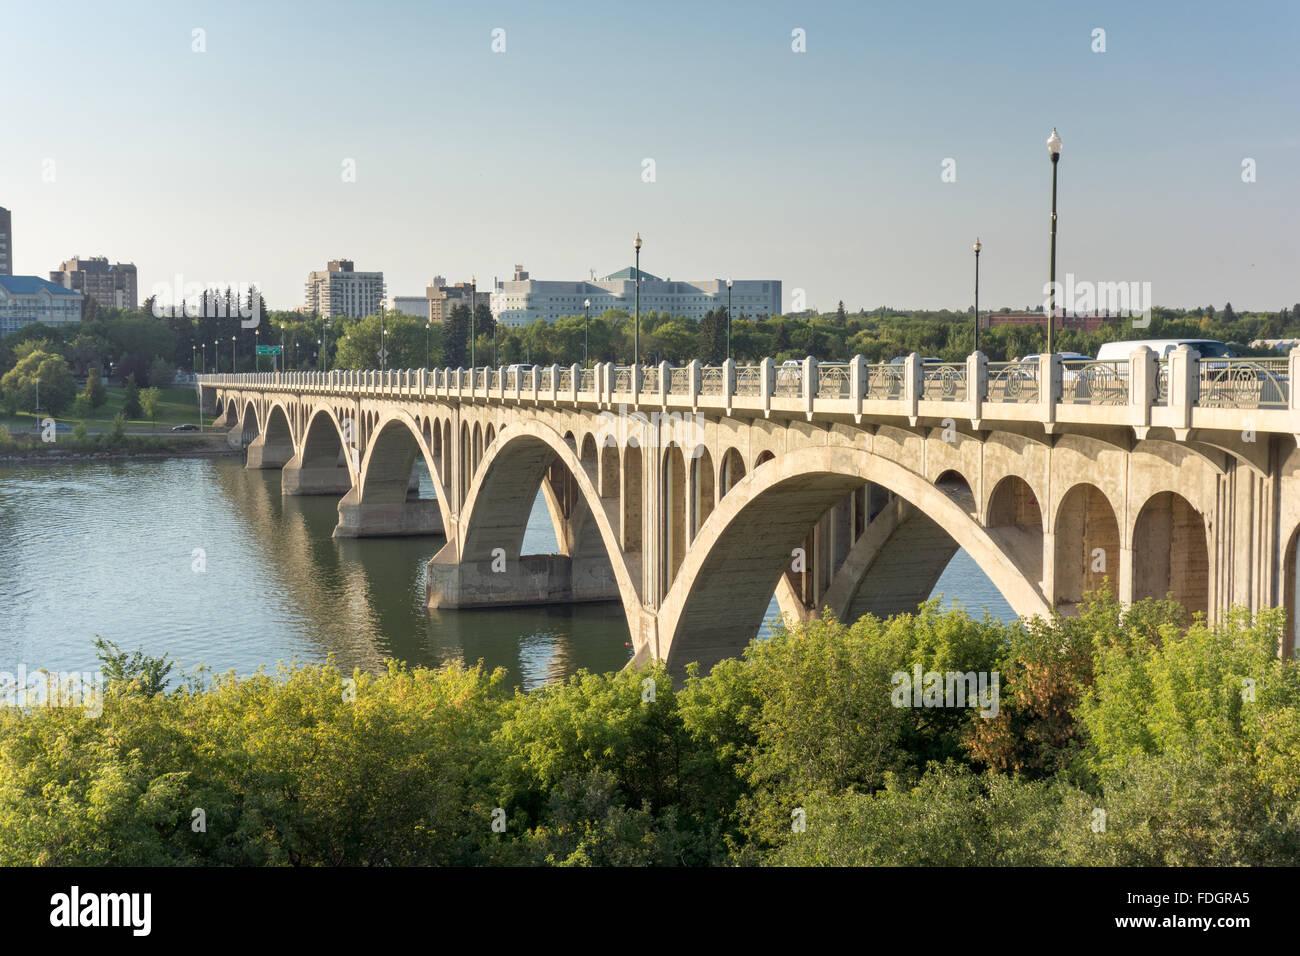 Bridge over the South Saskatchewan River, Saskatoon, Canada - Stock Image